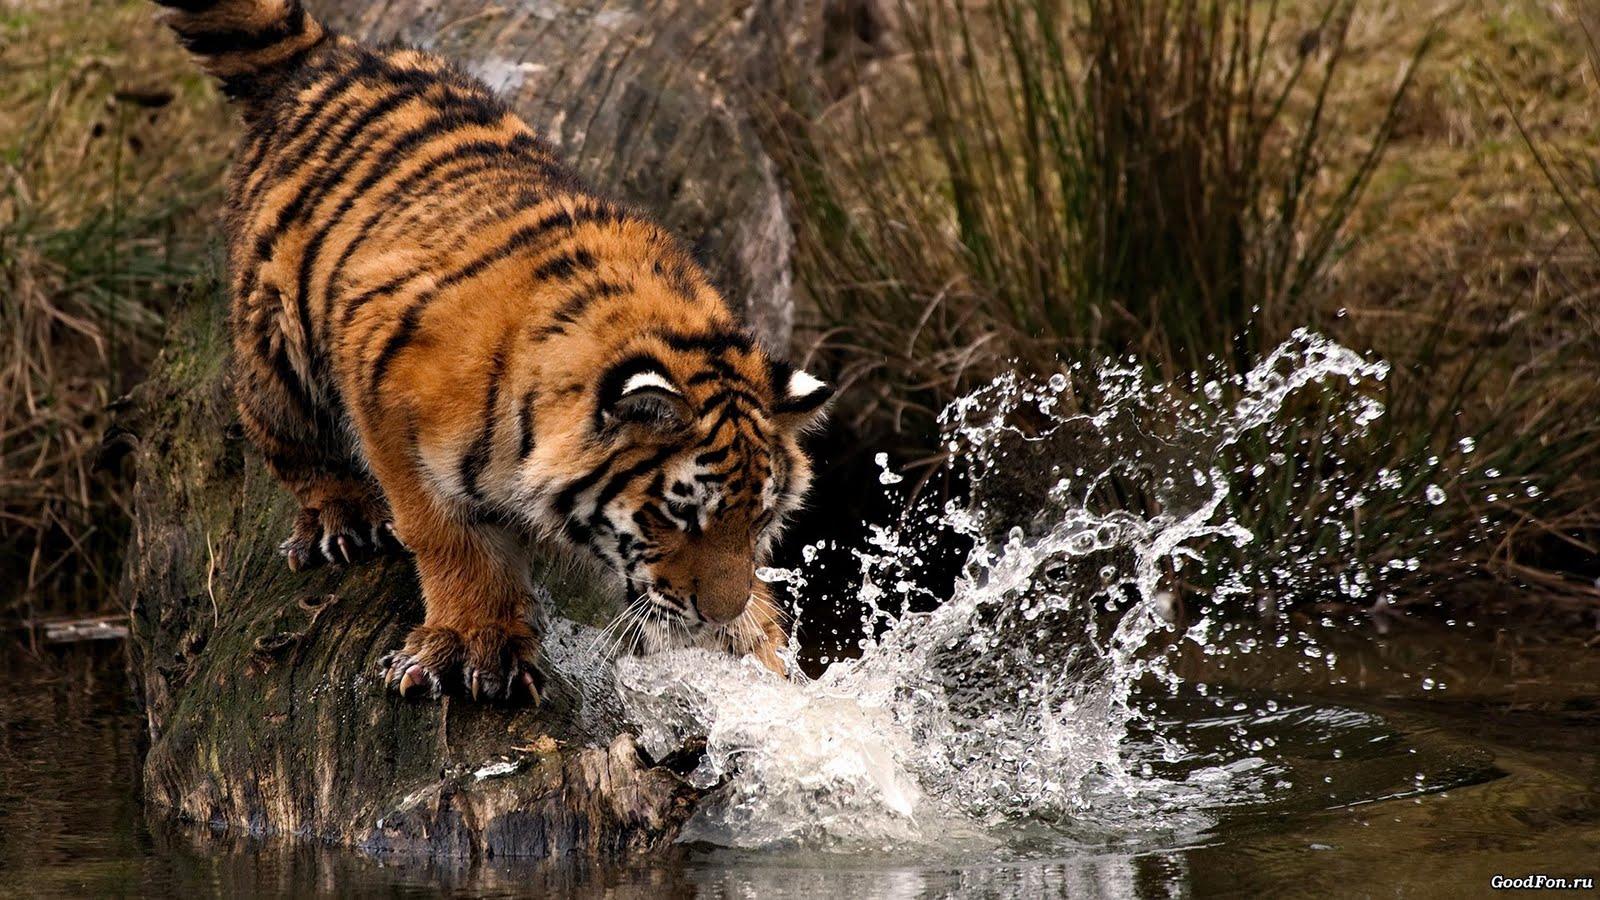 HD Tiger WallpapersTiger PicsTiger Images 1600x900